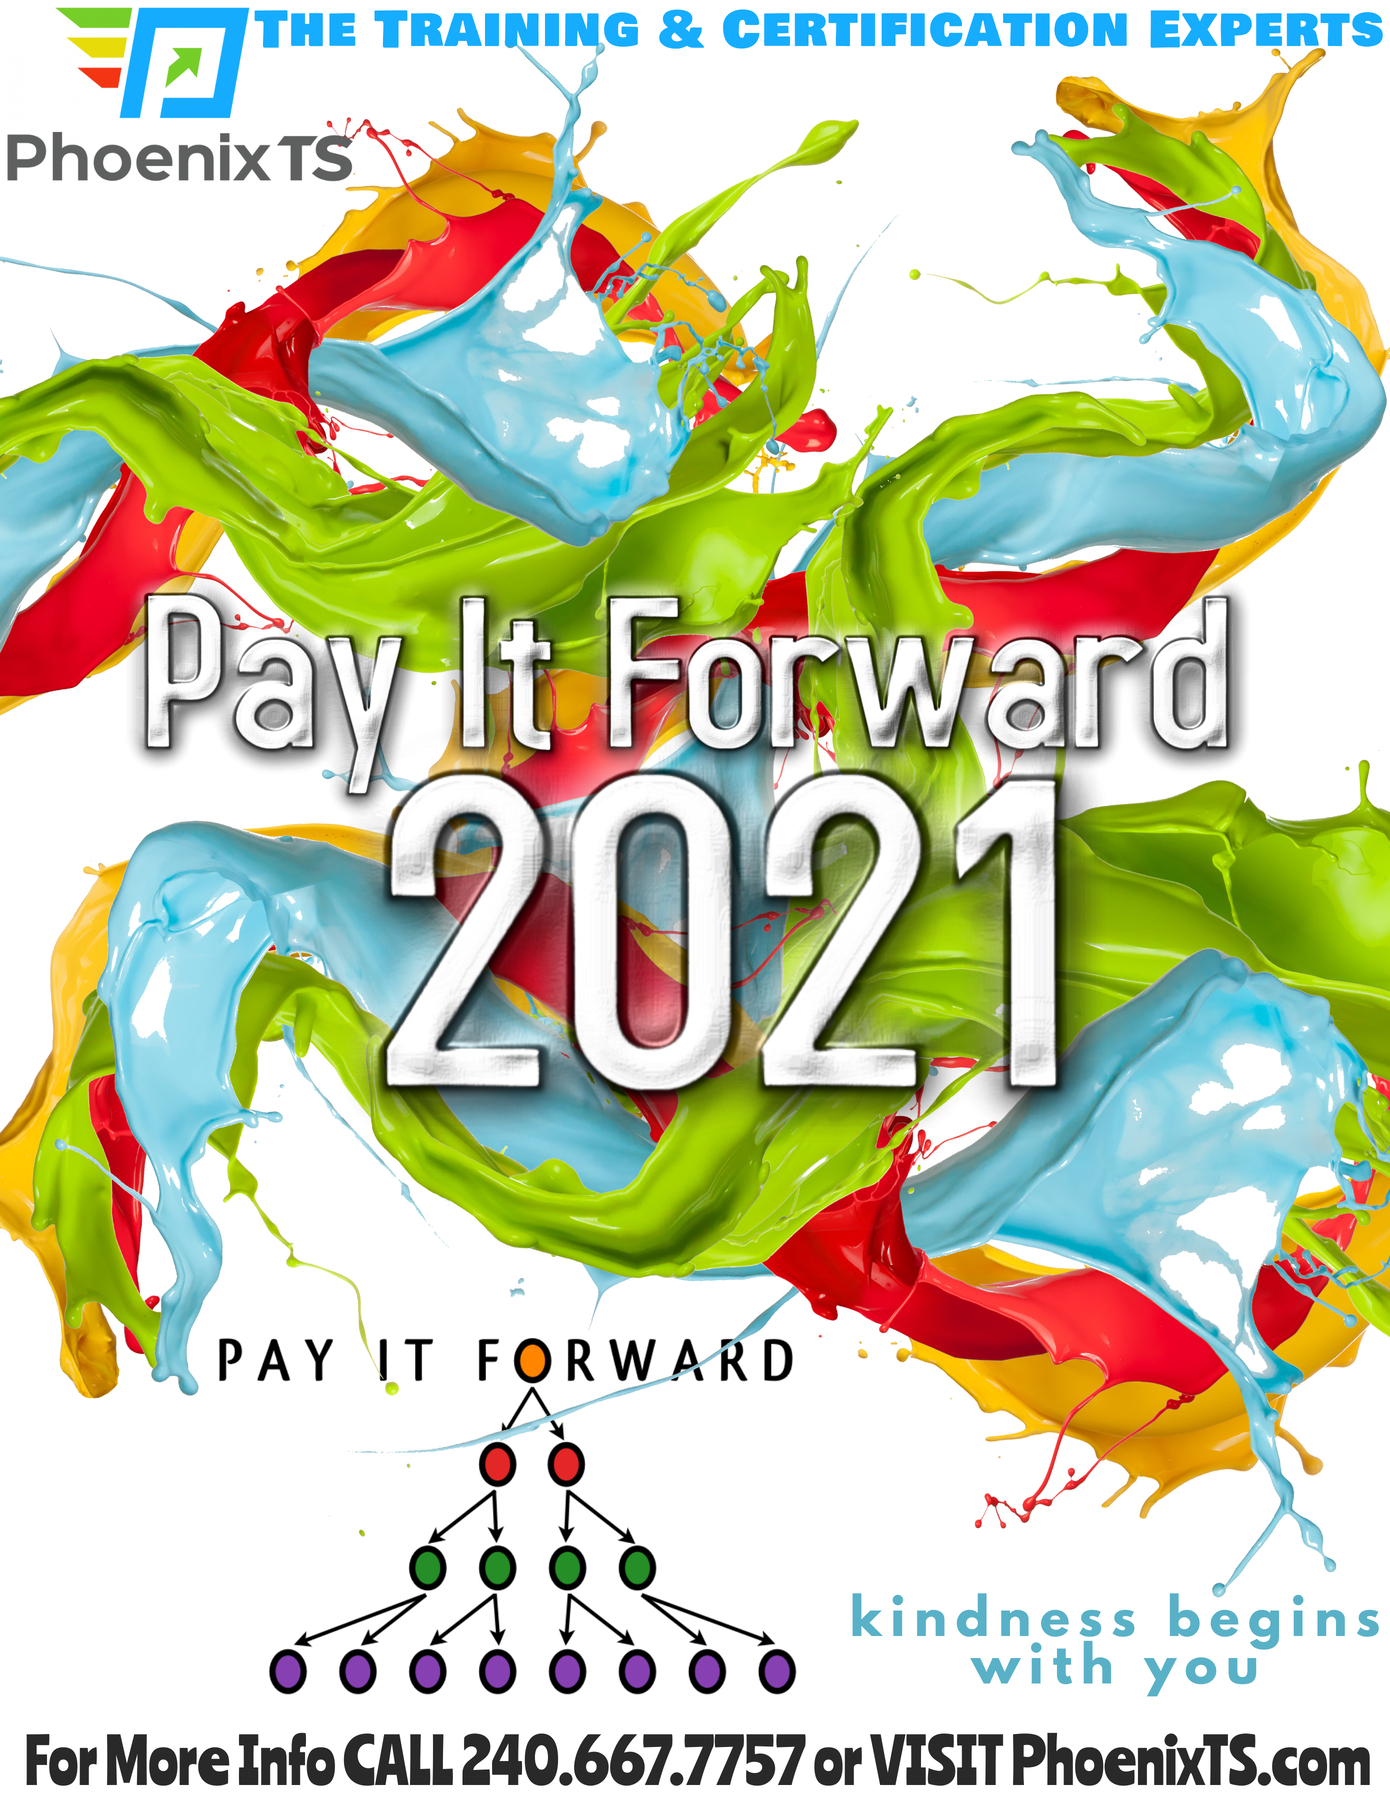 Pay it Forward 2021